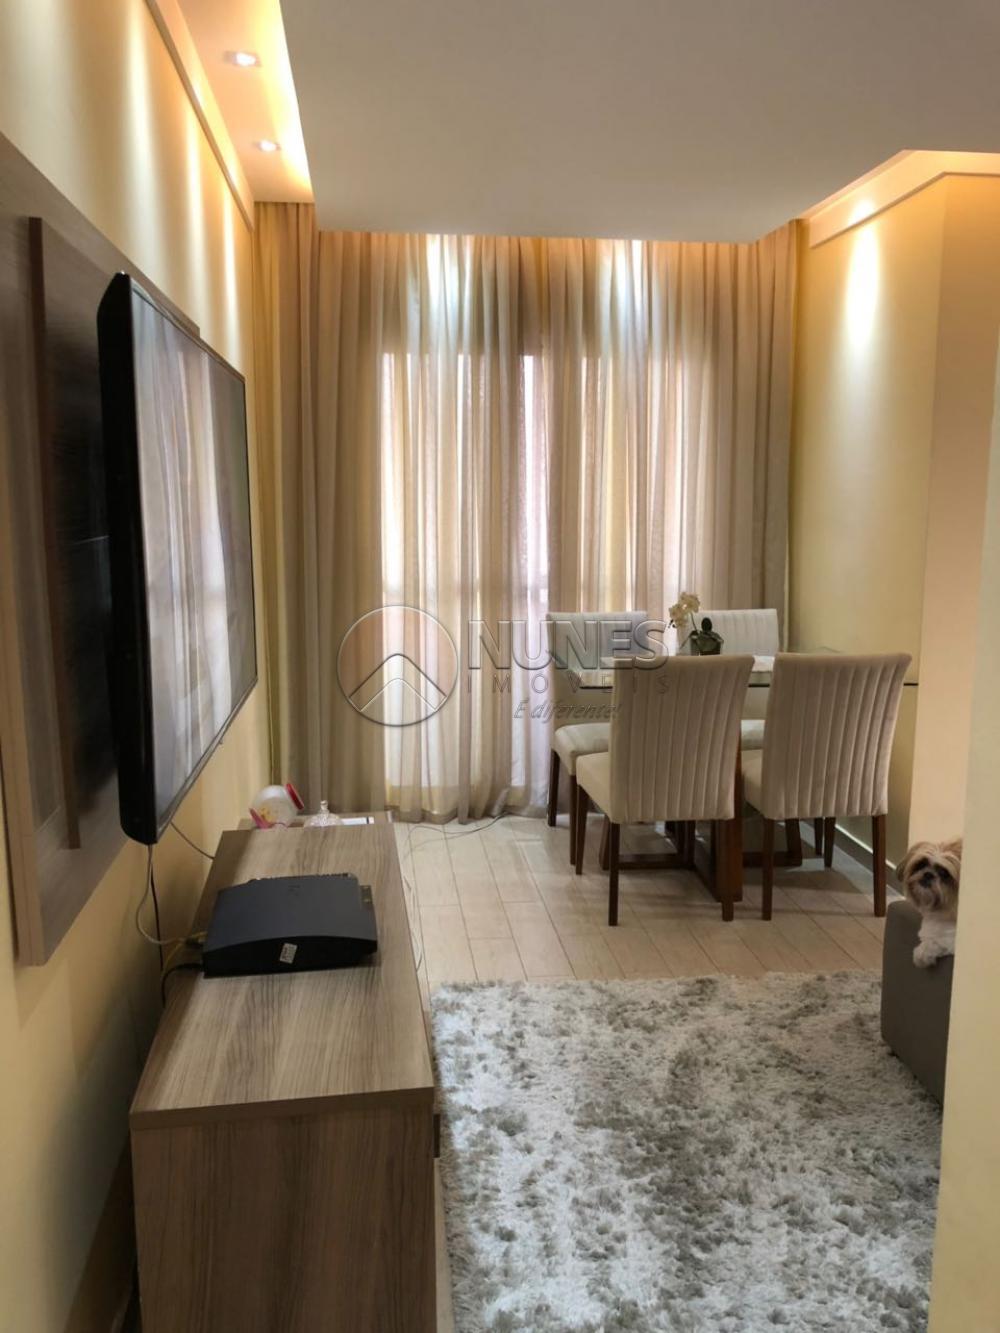 Osasco Apartamento Venda R$360.000,00 Condominio R$750,00 2 Dormitorios 1 Suite Area construida 61.00m2